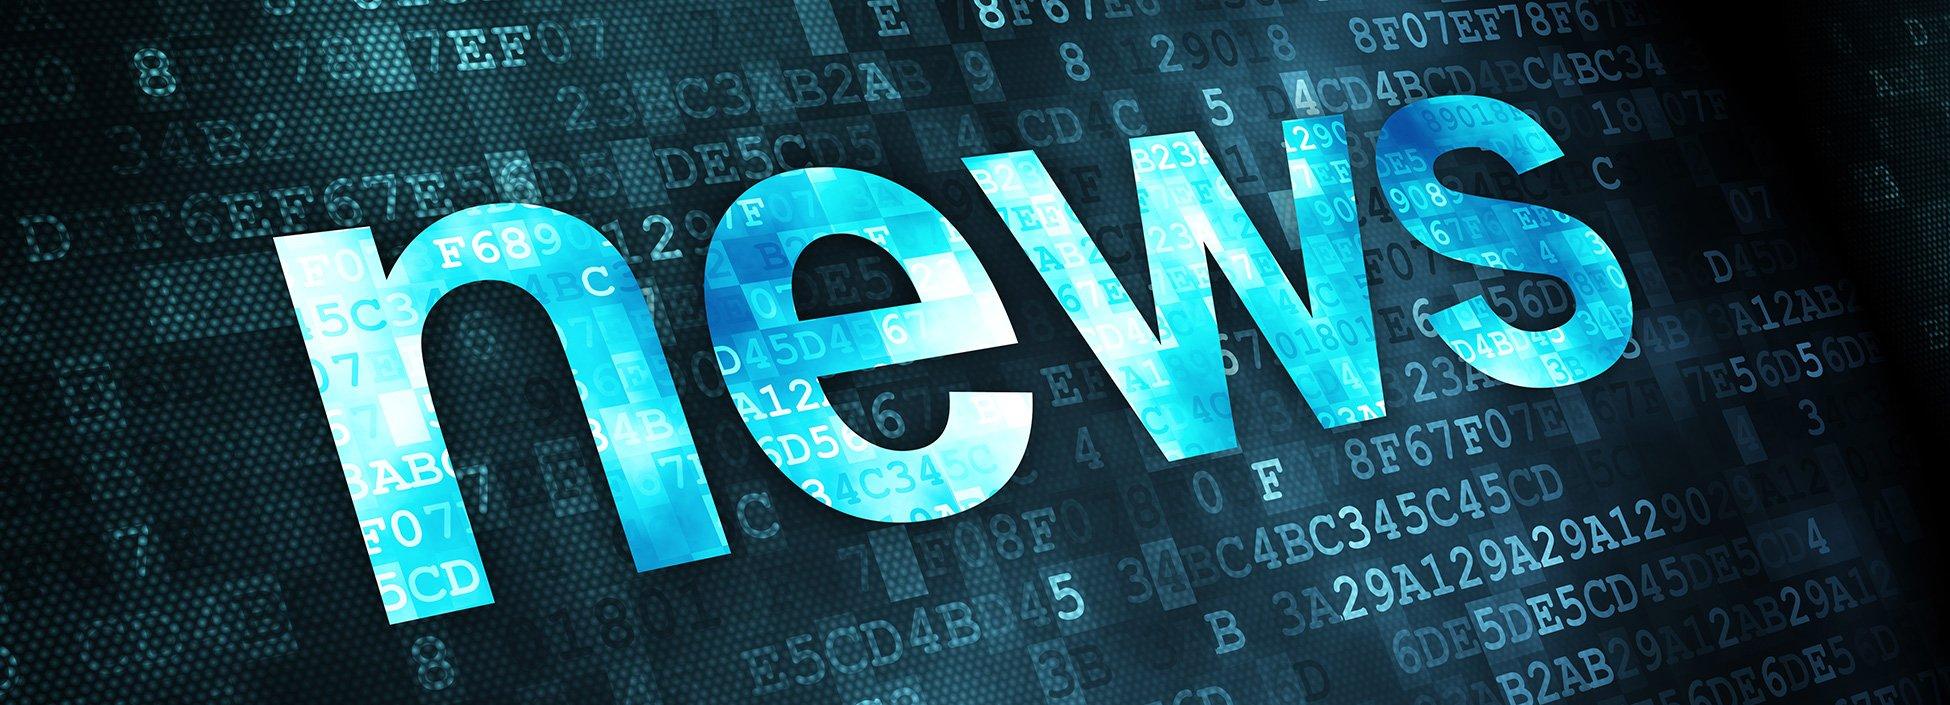 news 3 - 最新の情報をキャッチし続けたいのなら、無料ニュース速報をチェック!